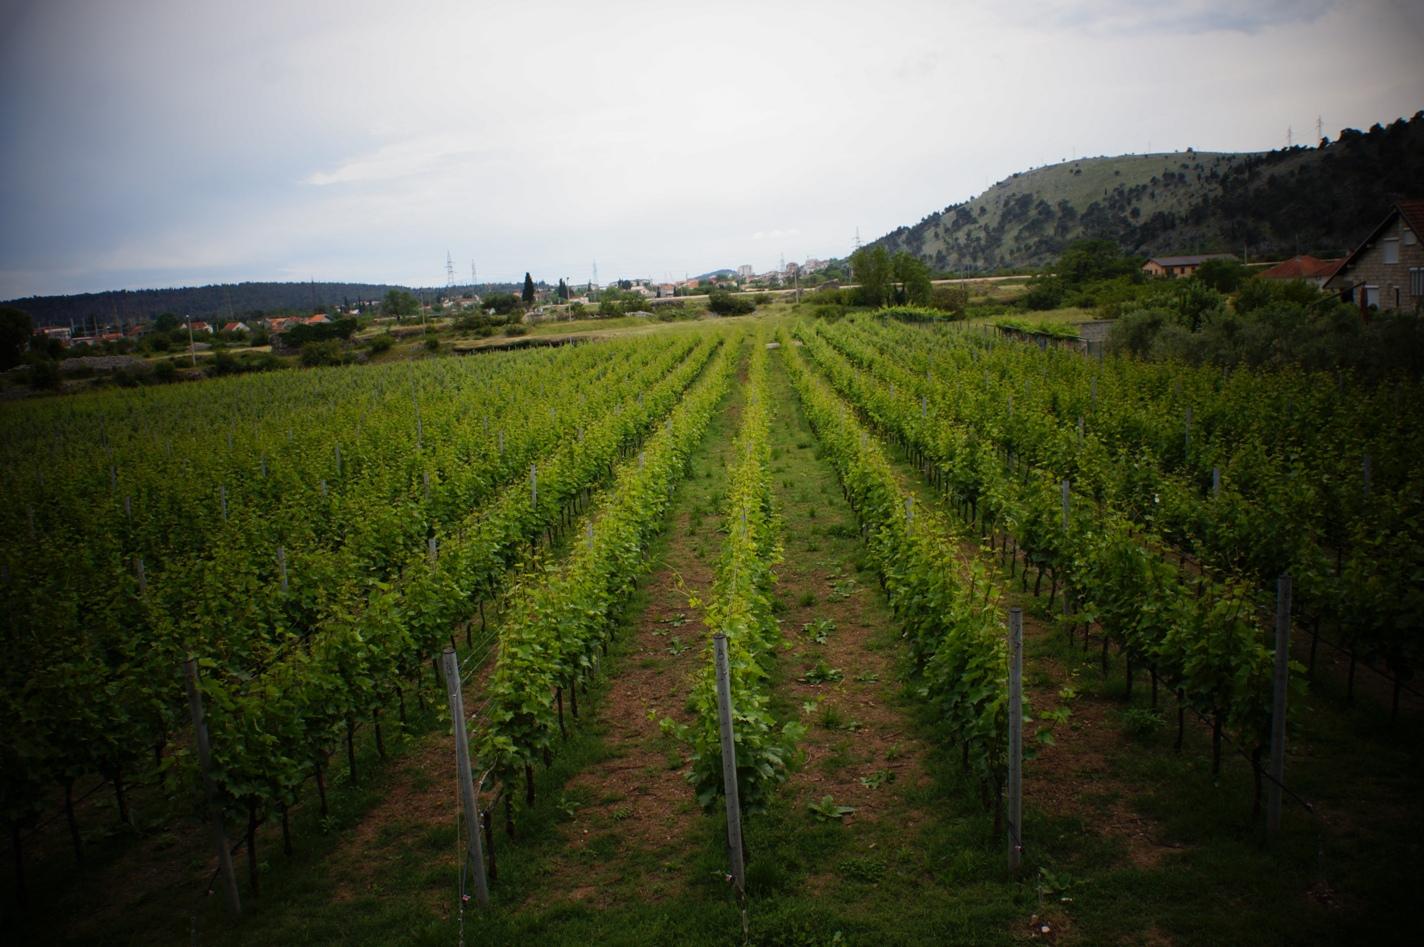 Winery Krgovic